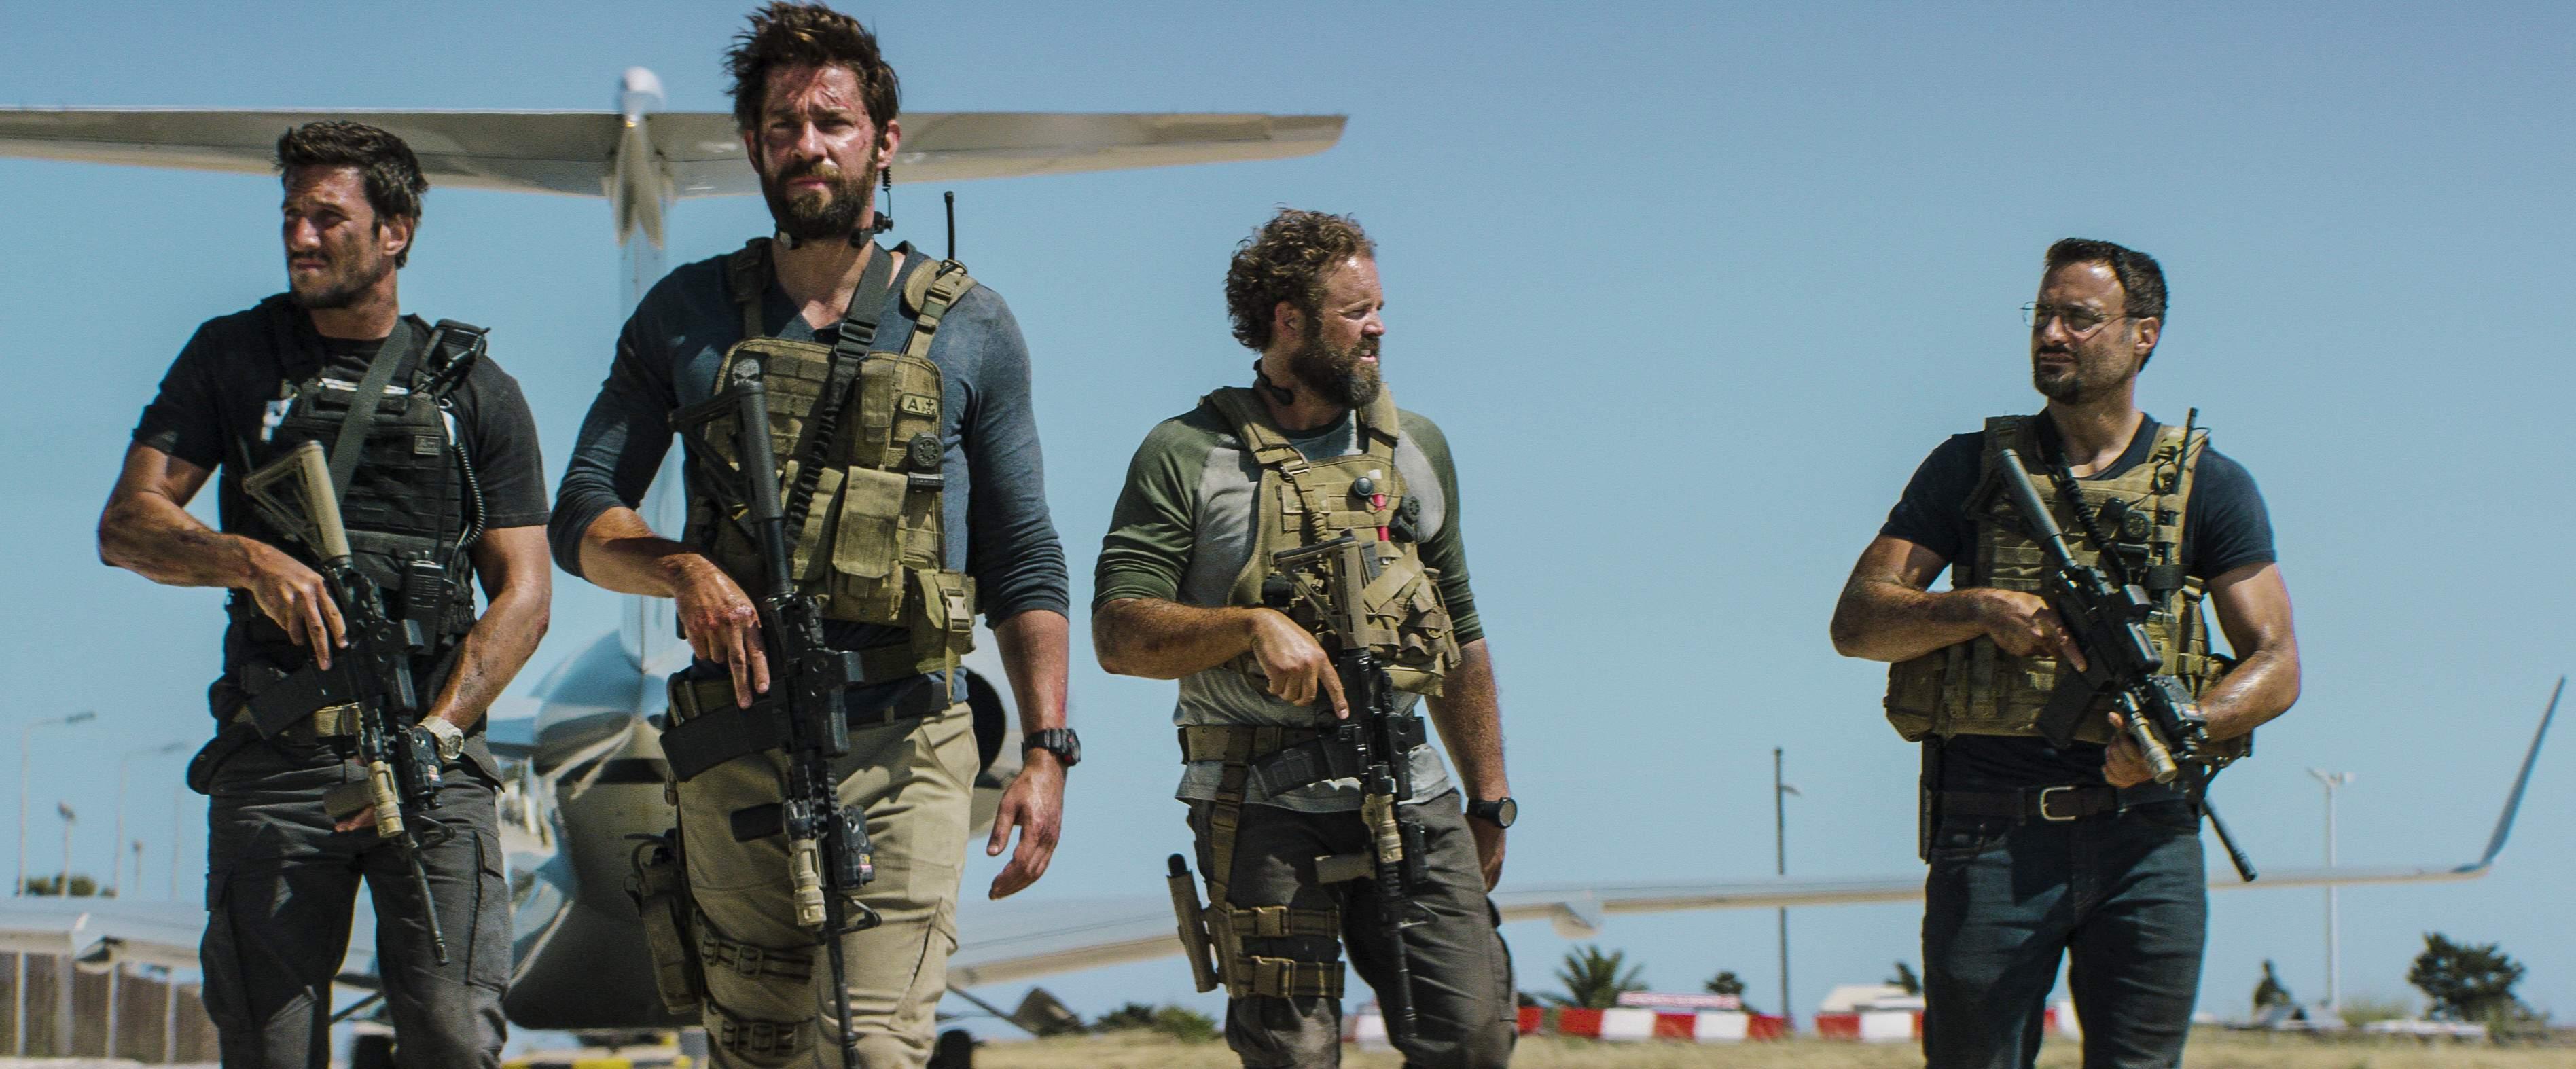 13 Hours: The Secret Soldiers Of Bengazi, UIP/ Paramount Pictres